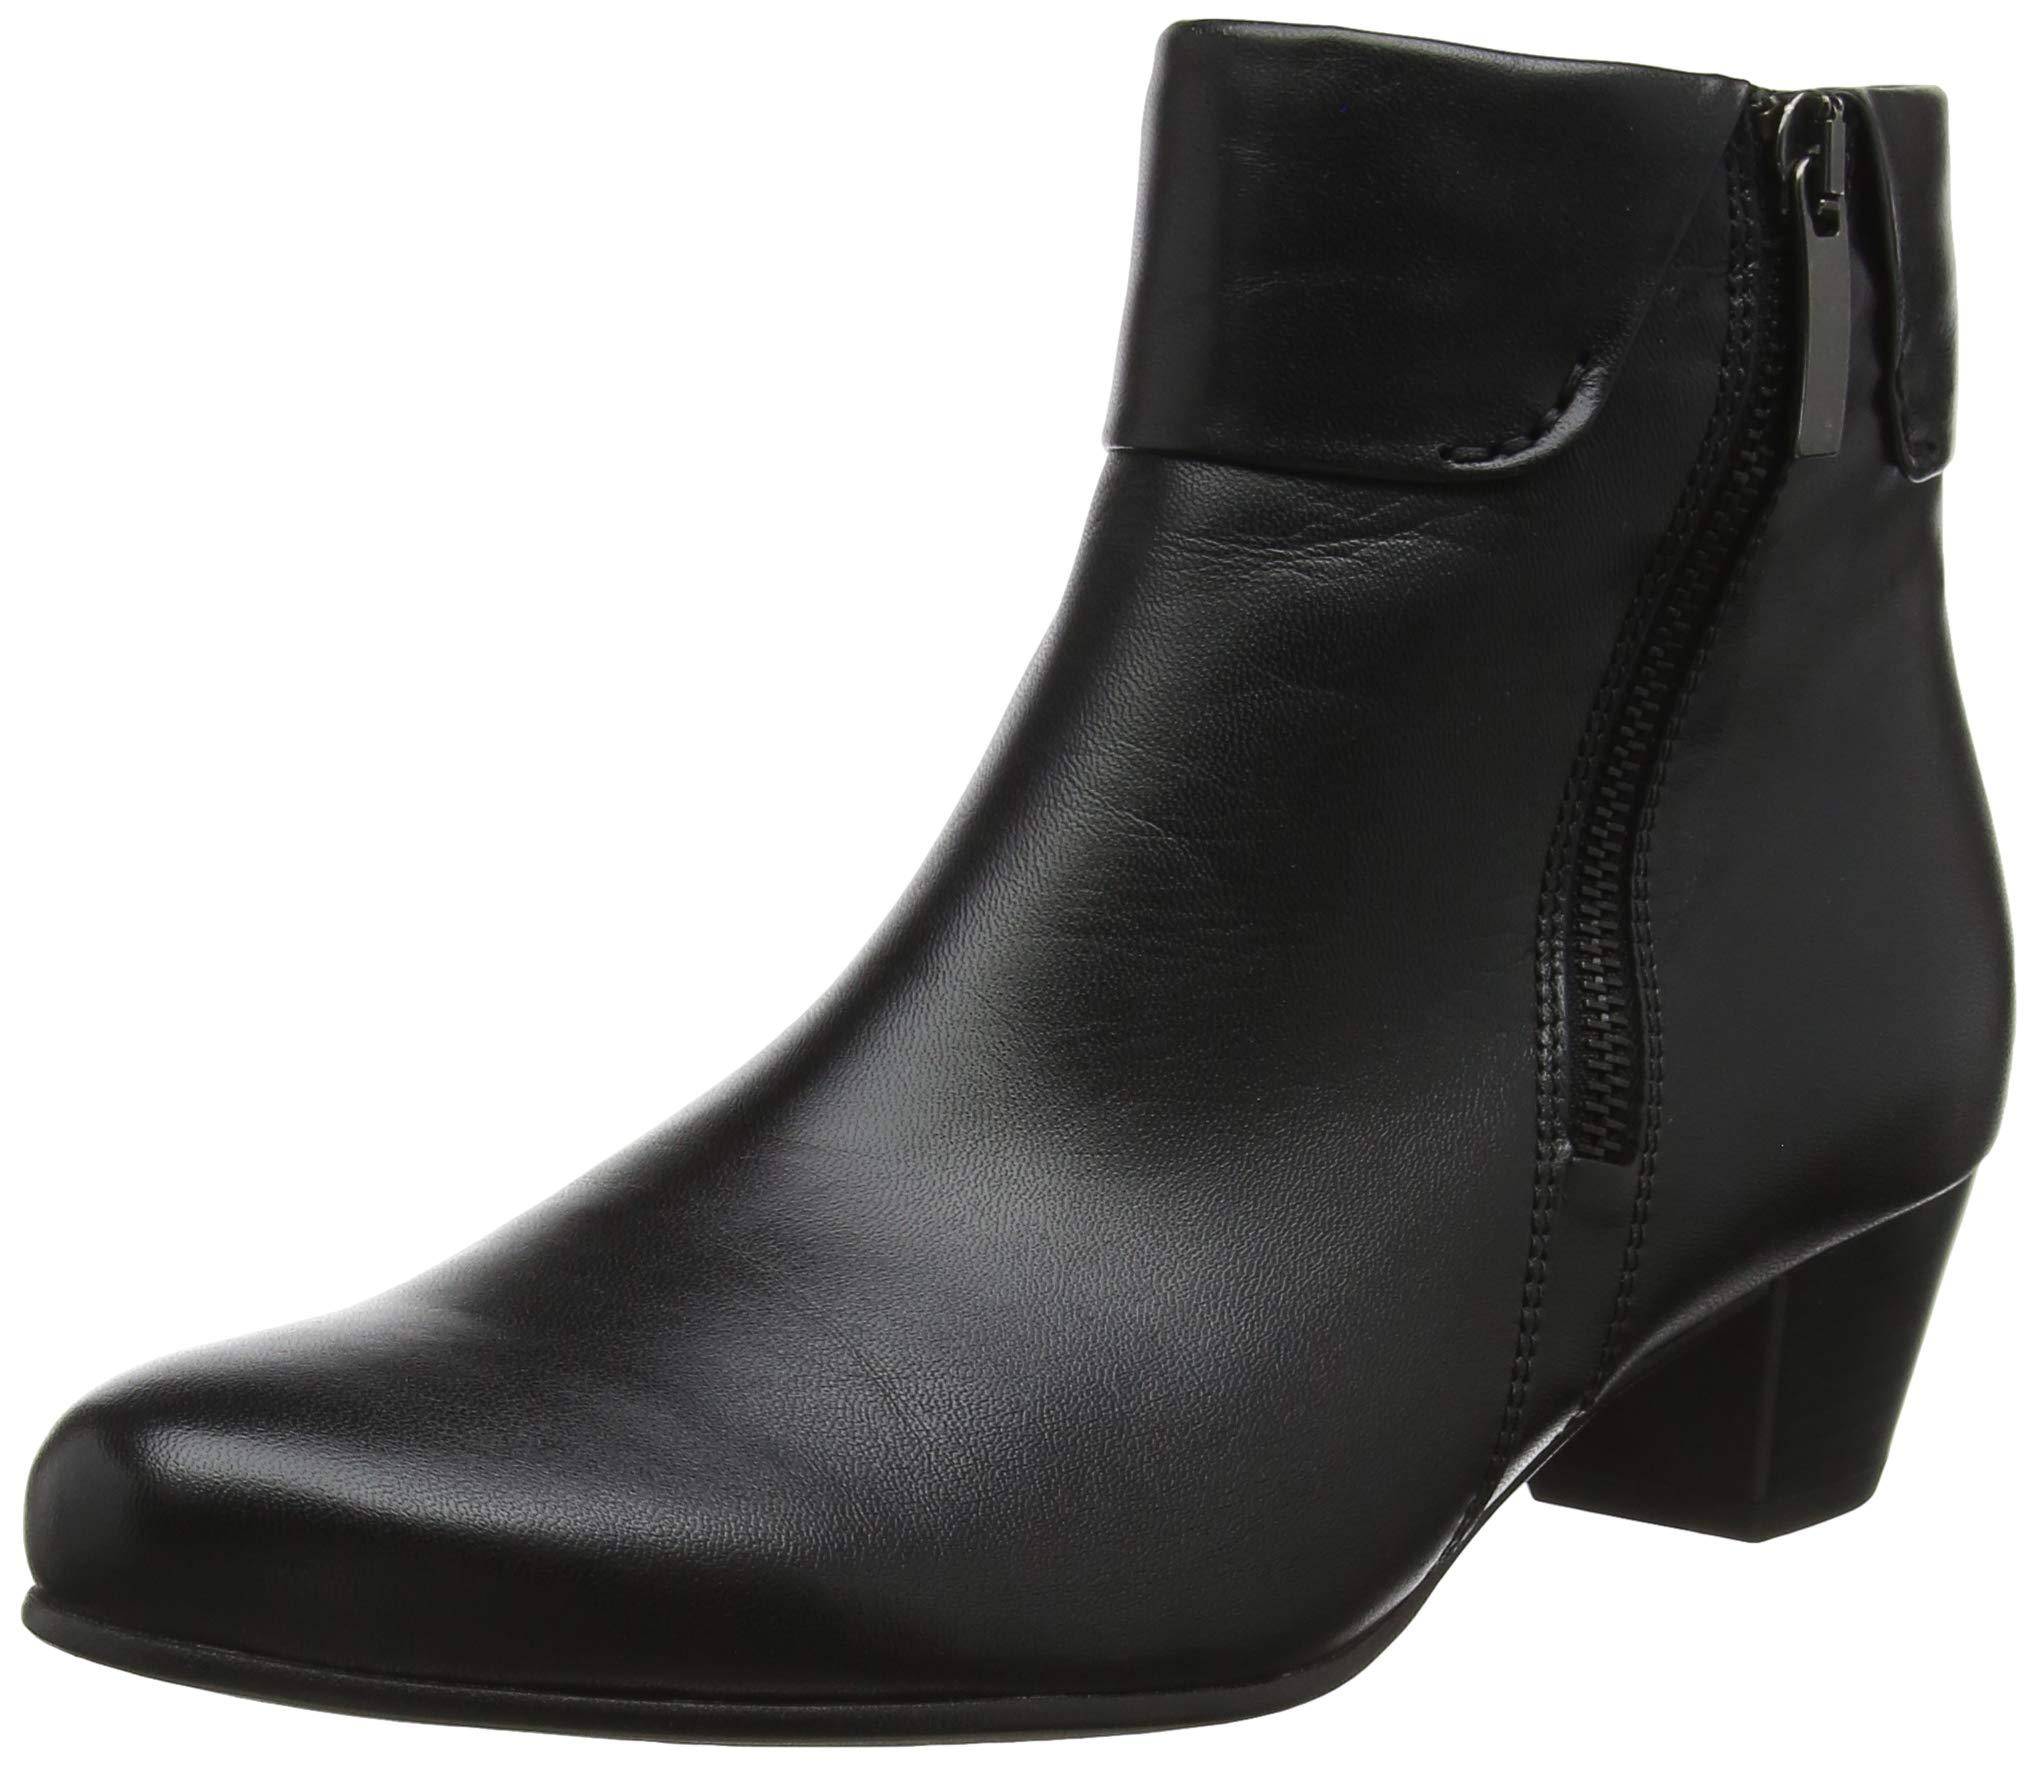 Shoes Comfort Eu Gabor BasicBotines FemmeNoirschwarzmicro5740 EH9IW2YD